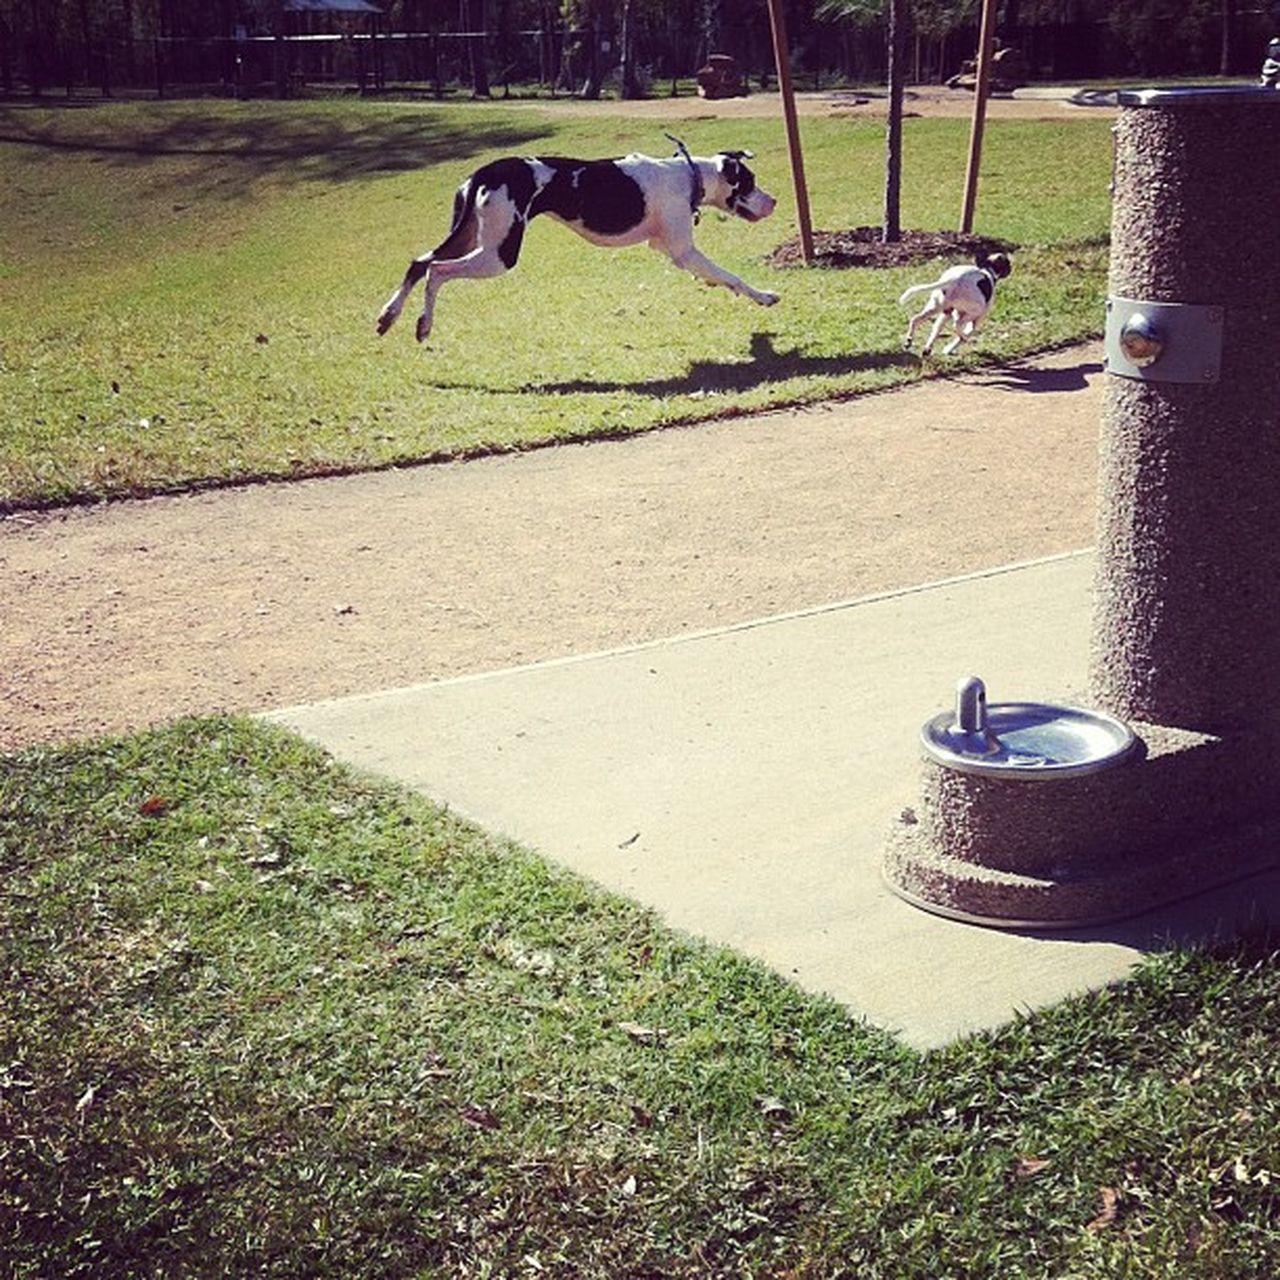 Capture The Moment Great Atmosphere Great Dane Dog Park Dog❤ Dogsofinstagram Glitch